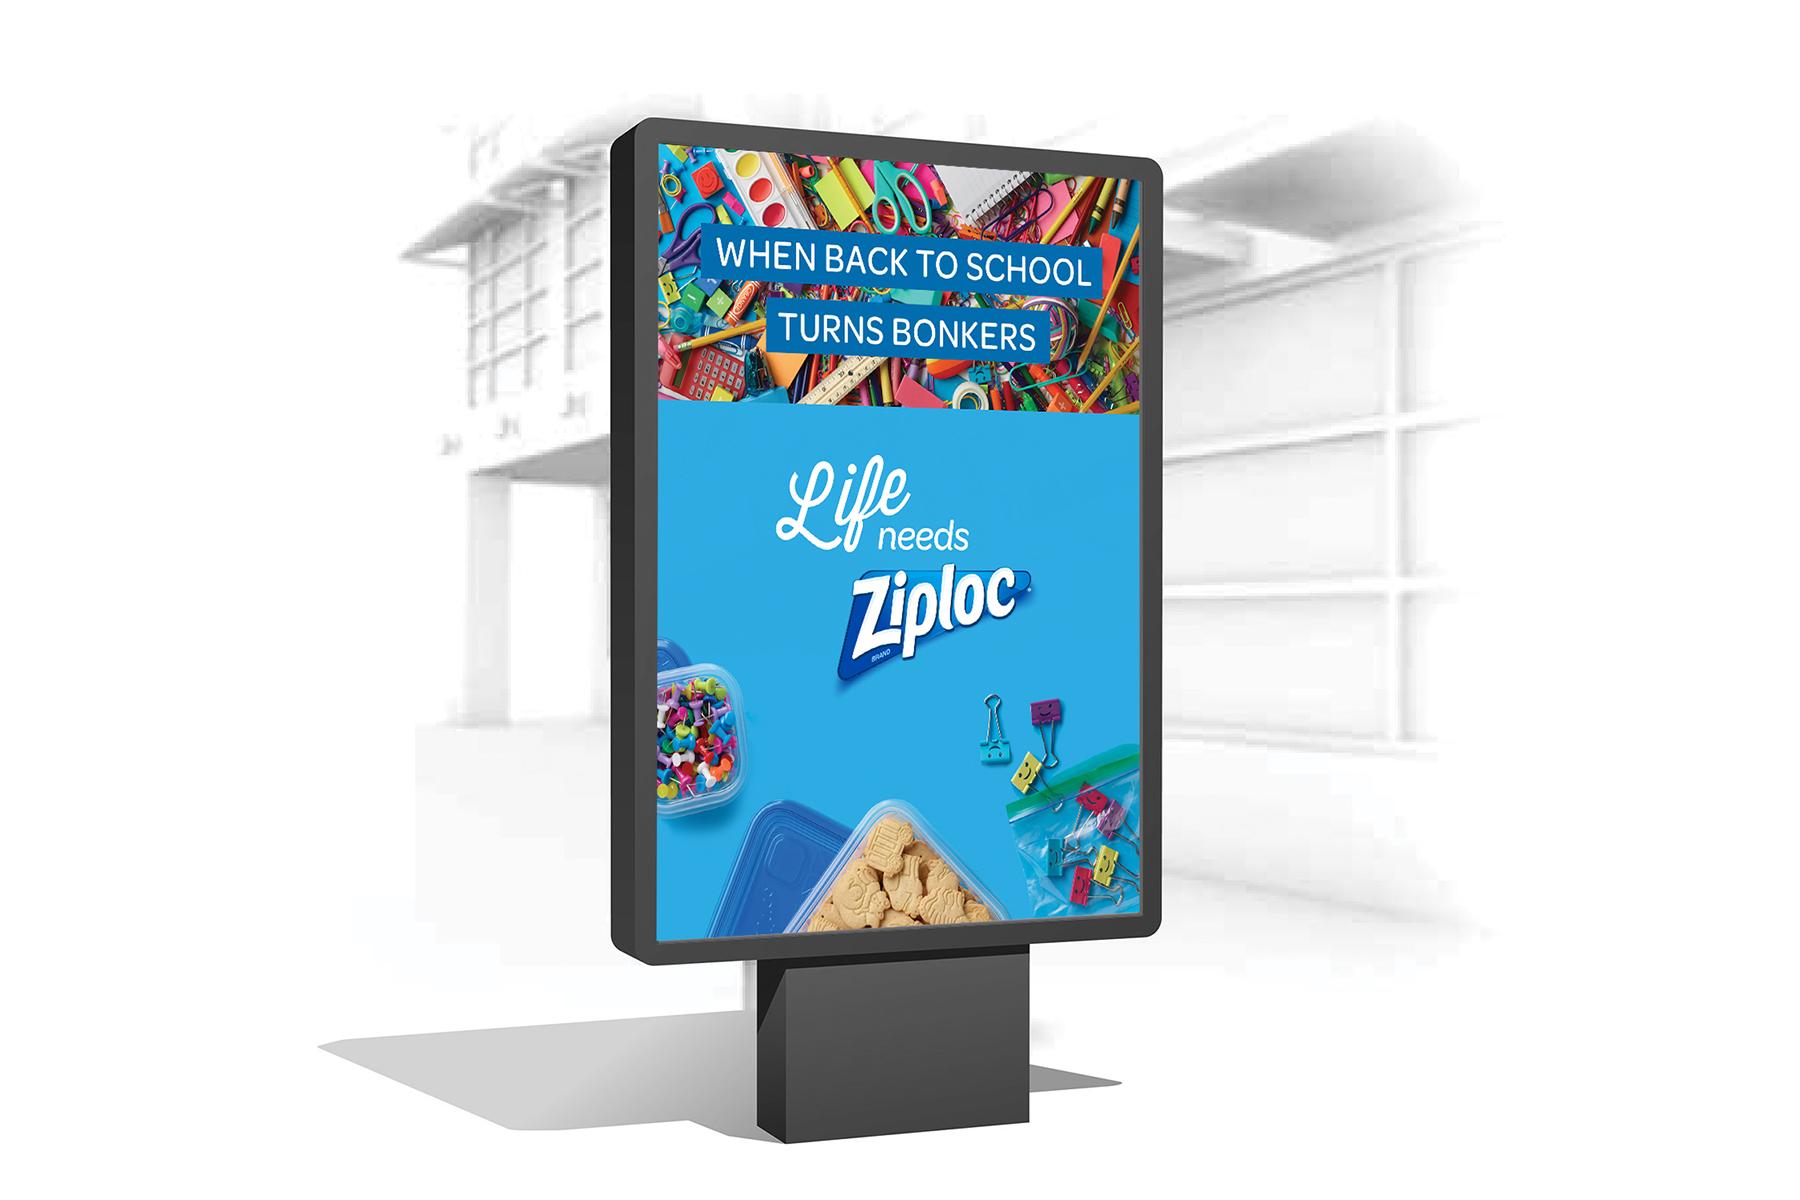 Ziploc_Chaos_BTS_6x4_Poster.jpg